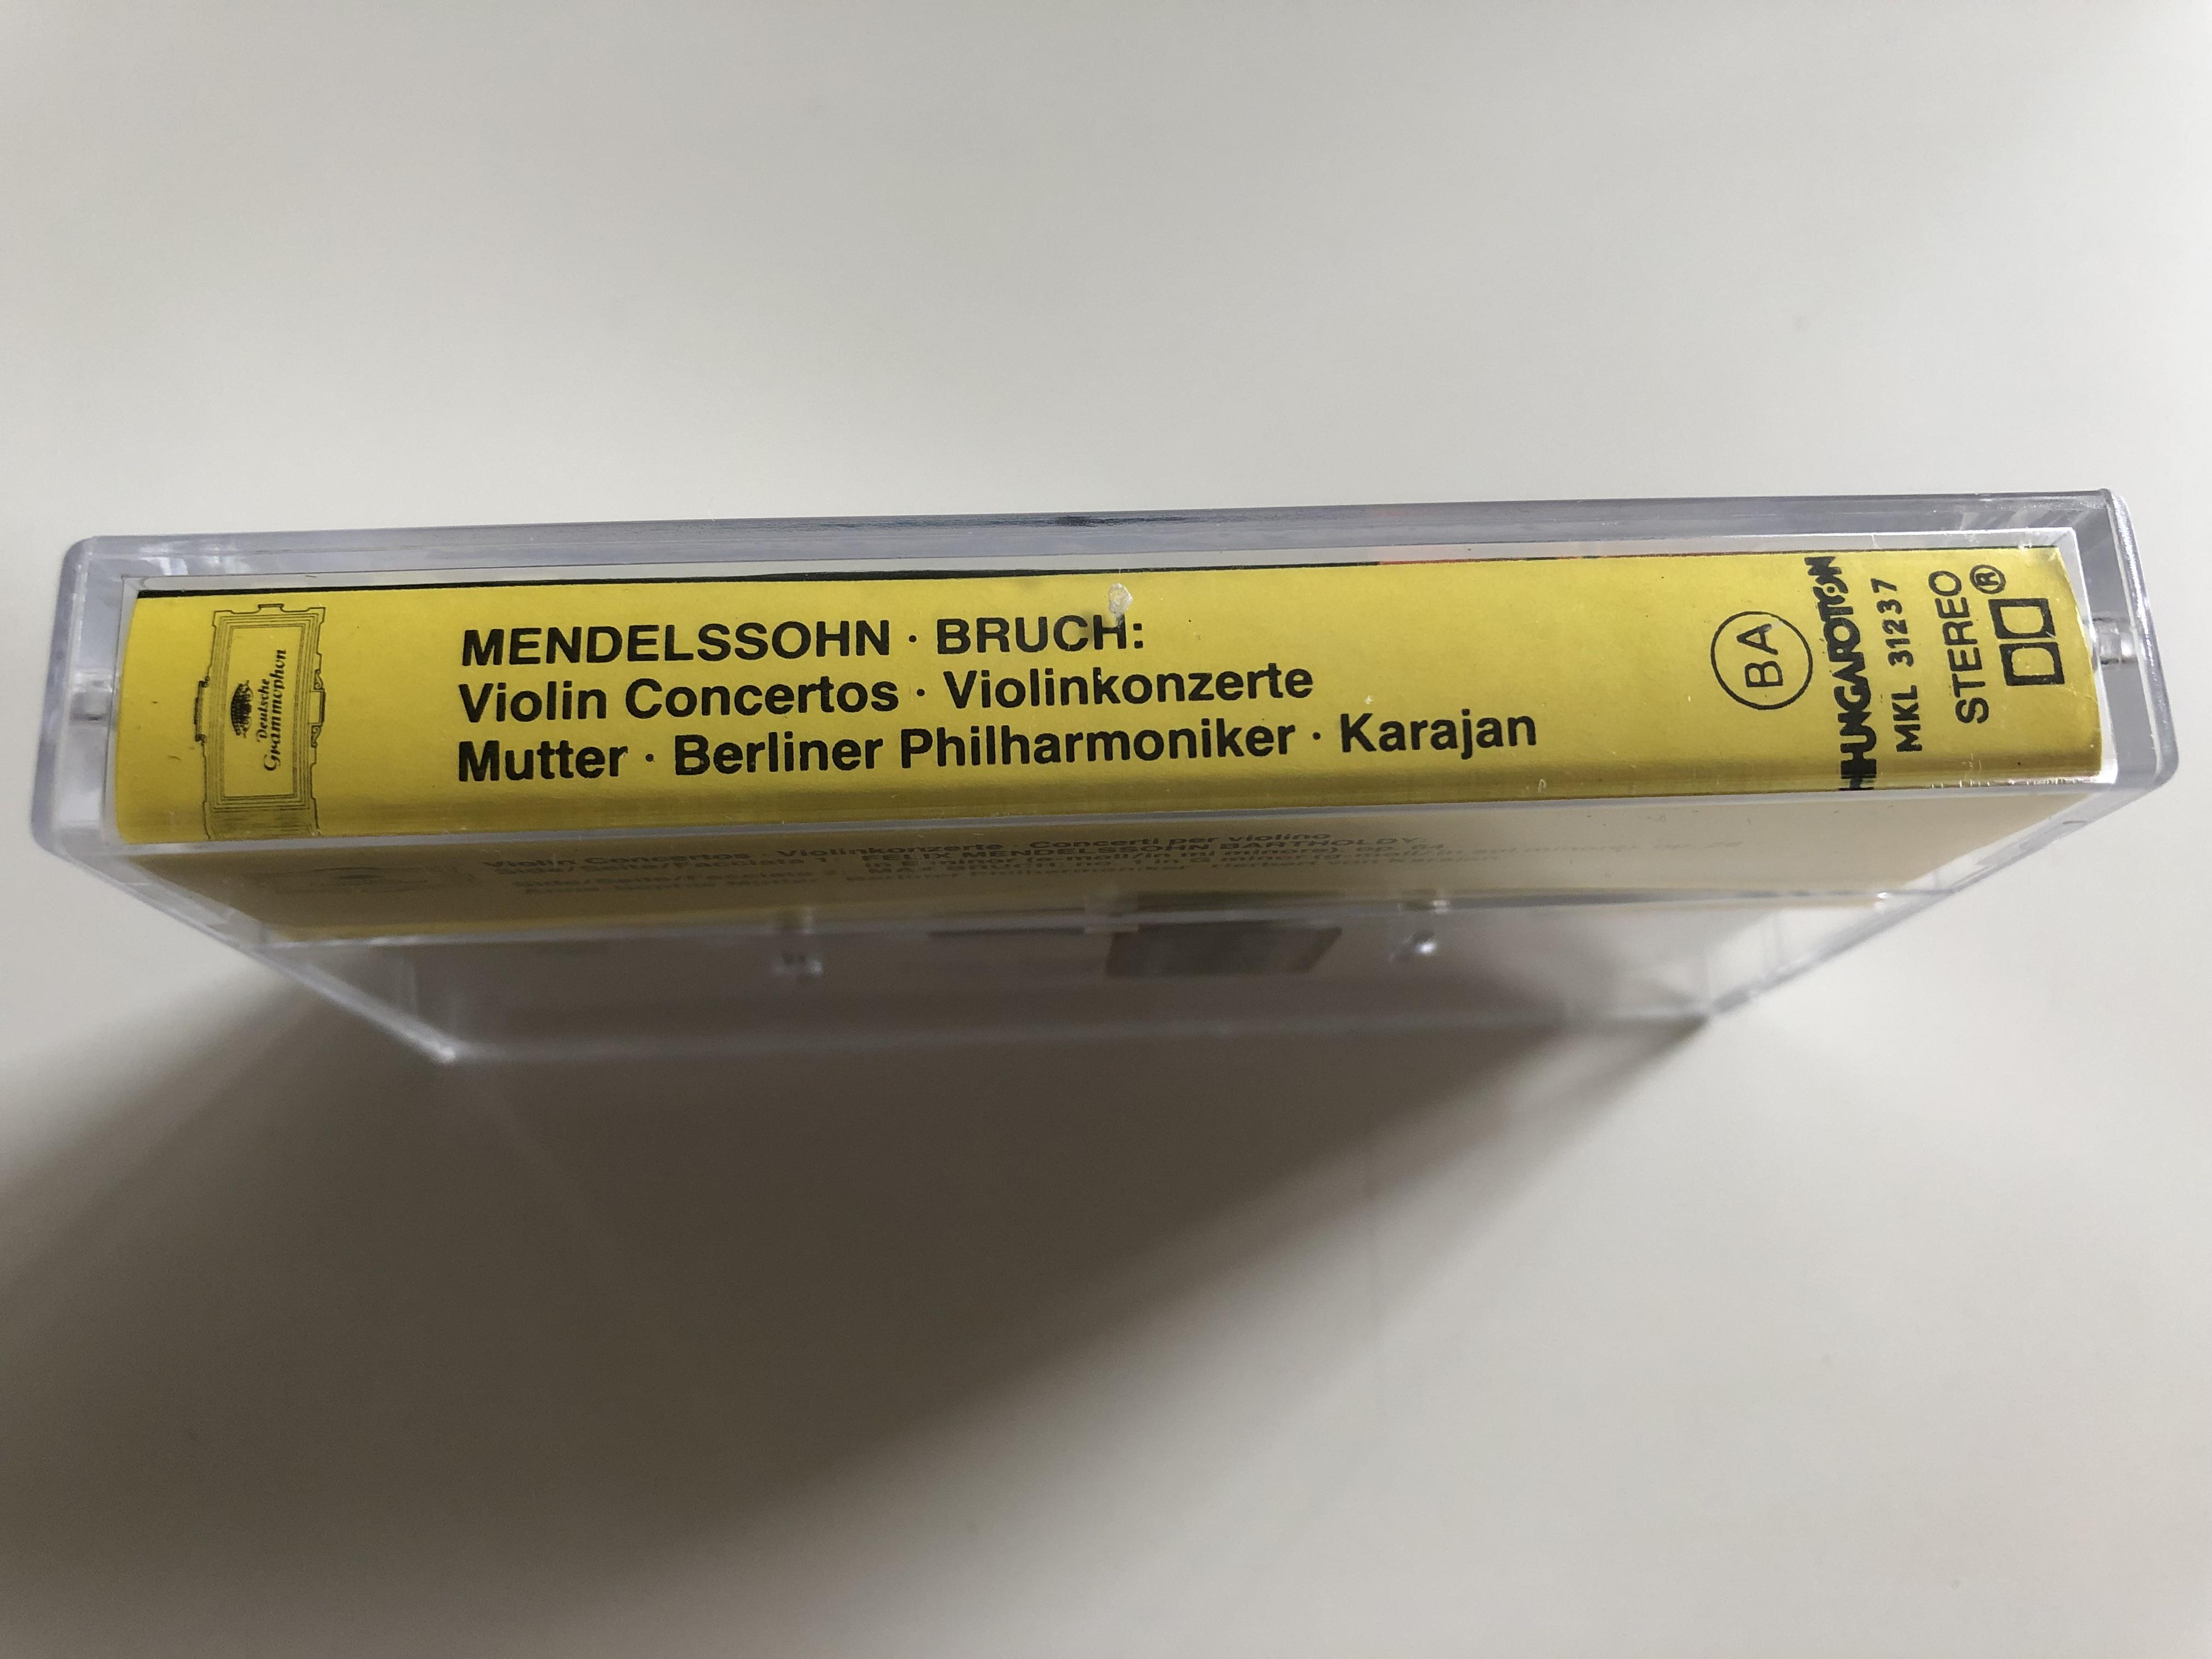 mendelssohn-bruch-violinkonzerte-anne-sophie-mutter-berliner-philharmoniker-conducted-herbert-von-karajan-deutsche-grammophon-hungaroton-cassette-stereo-mkl-31237-5-.jpg